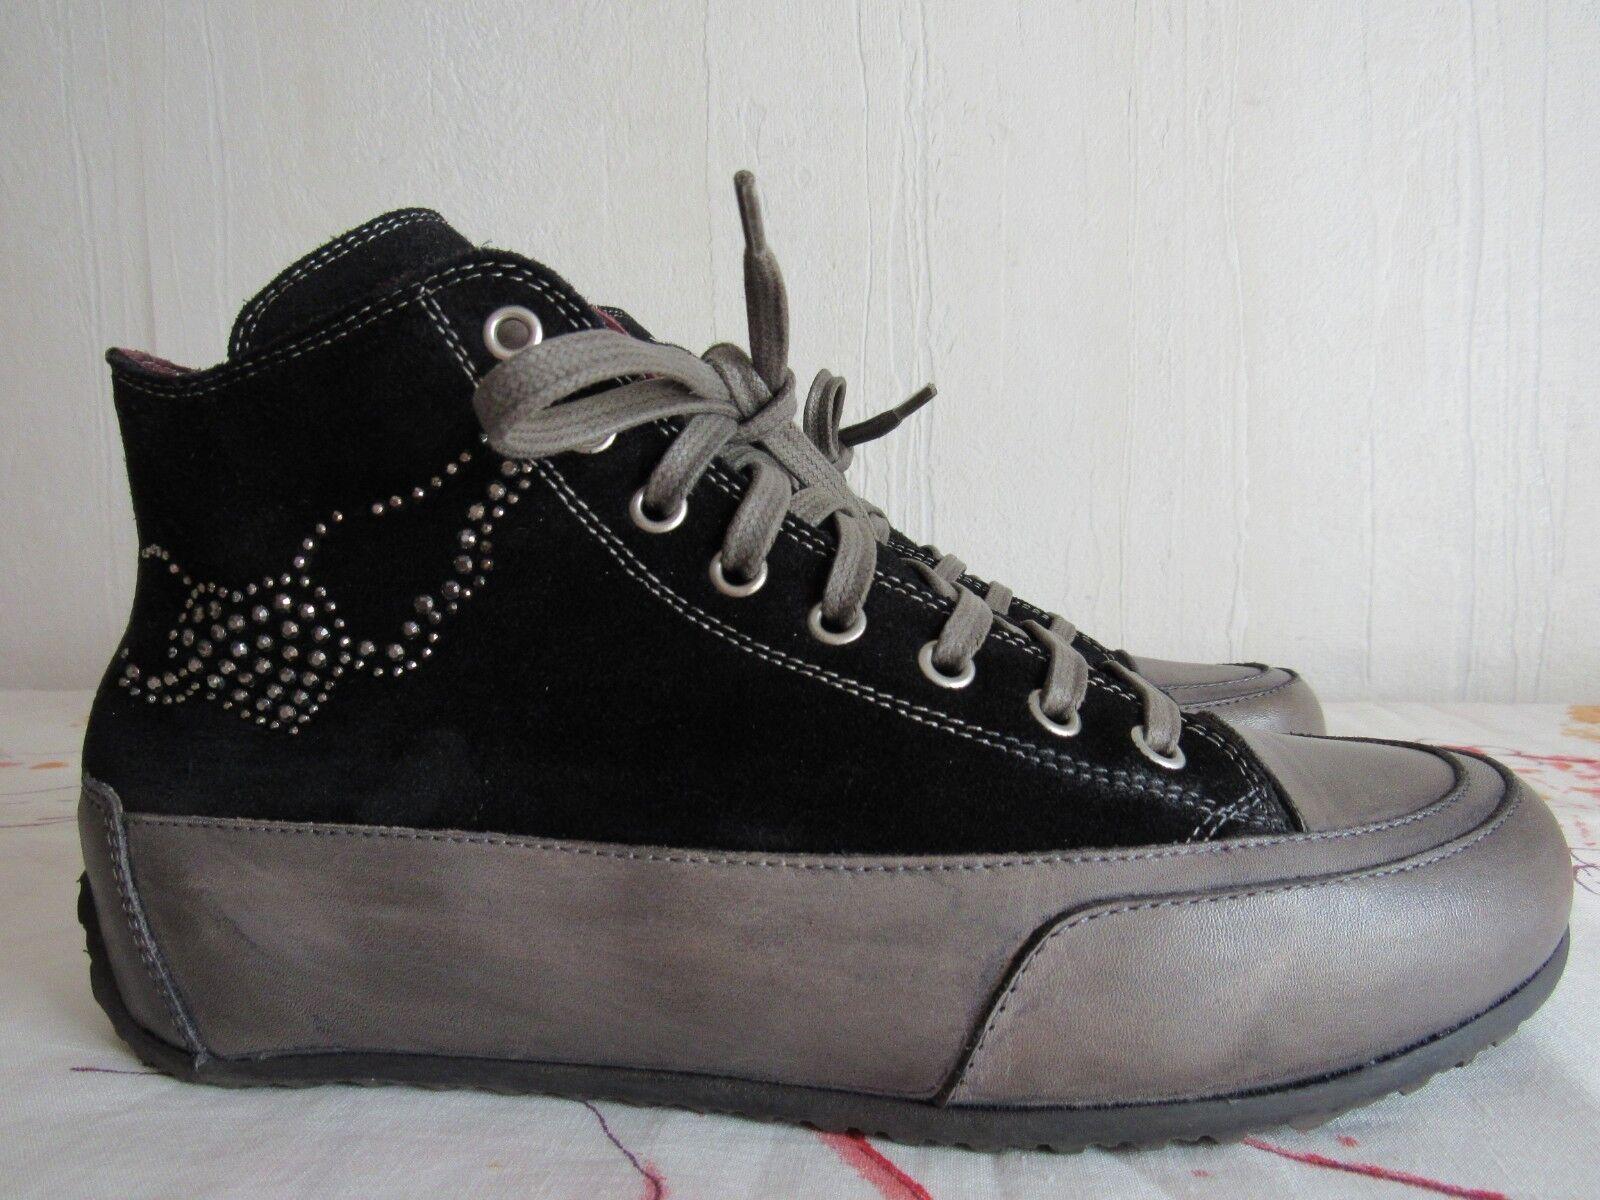 Candice Cooper Sneakers Stifeletten  Gr.37 Leder Schwarz / / / Grau c0ce0d